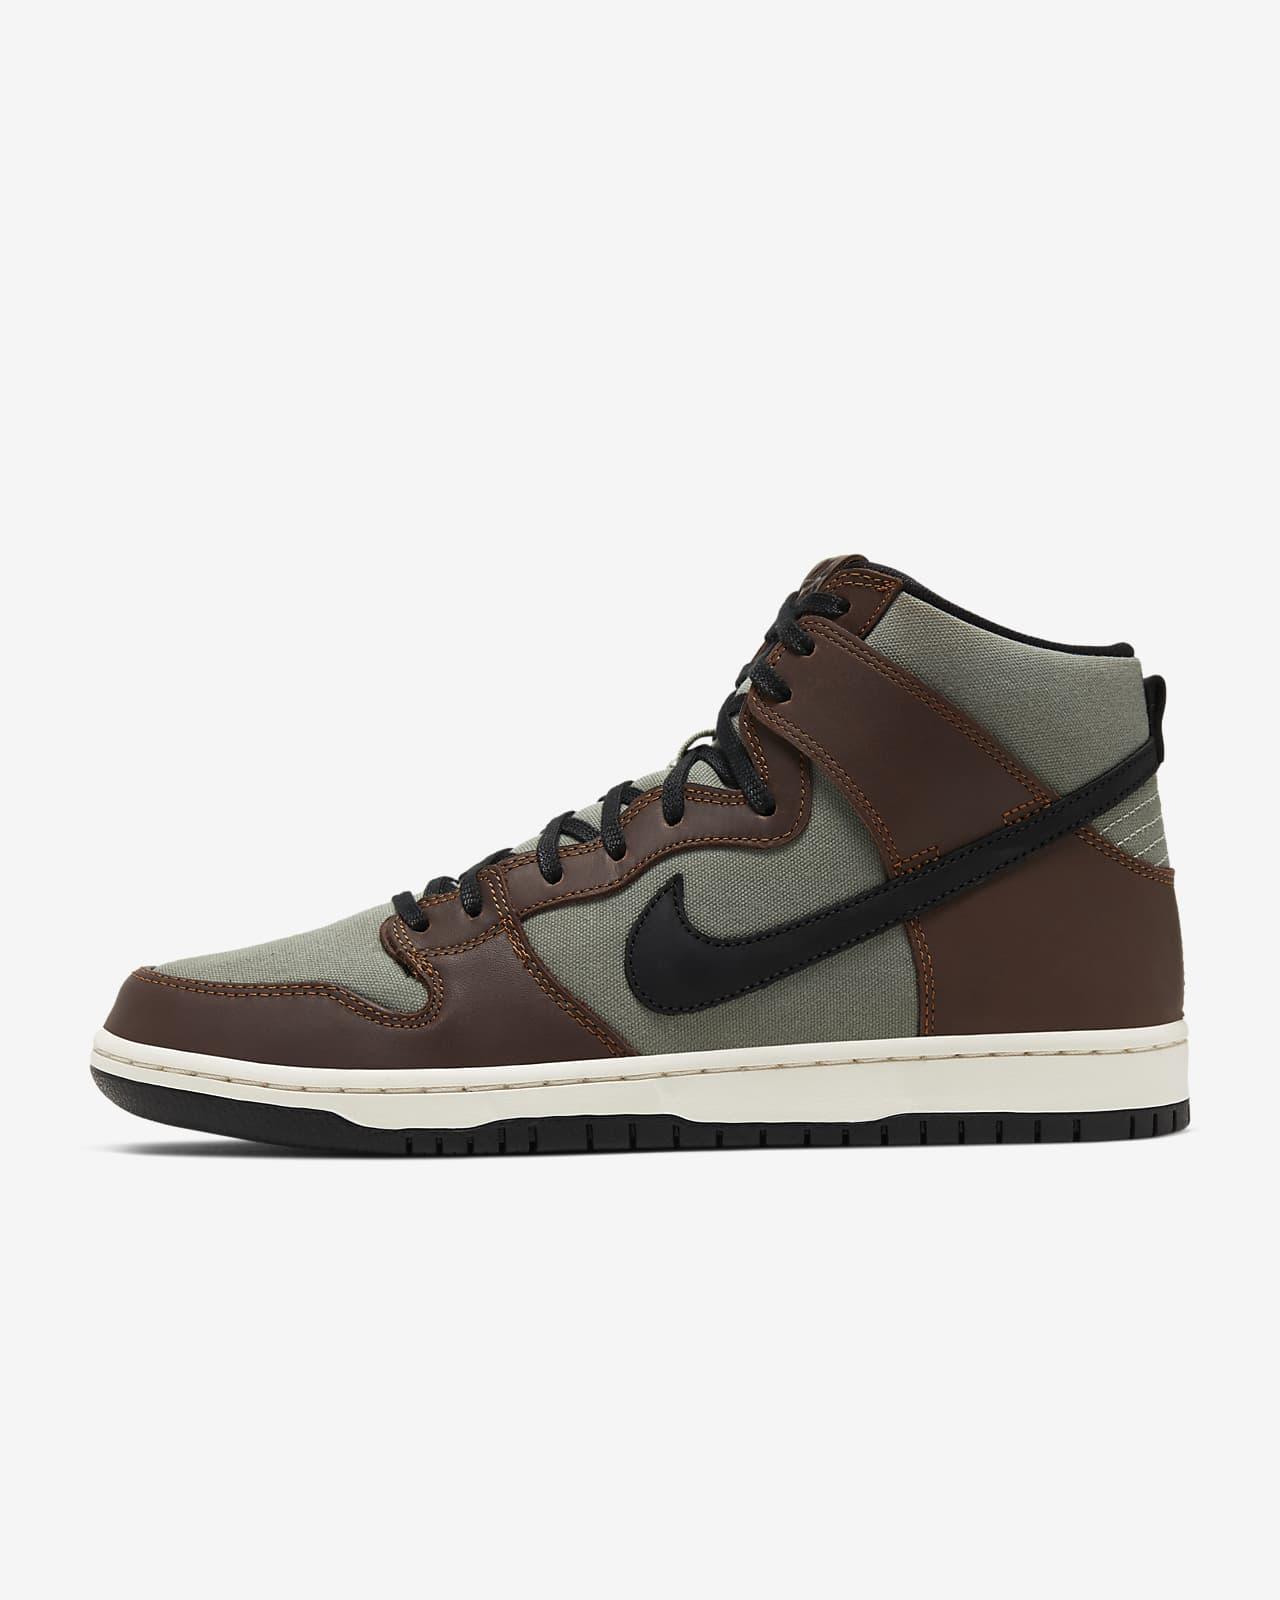 Nike SB Dunk High Pro 男/女运动鞋